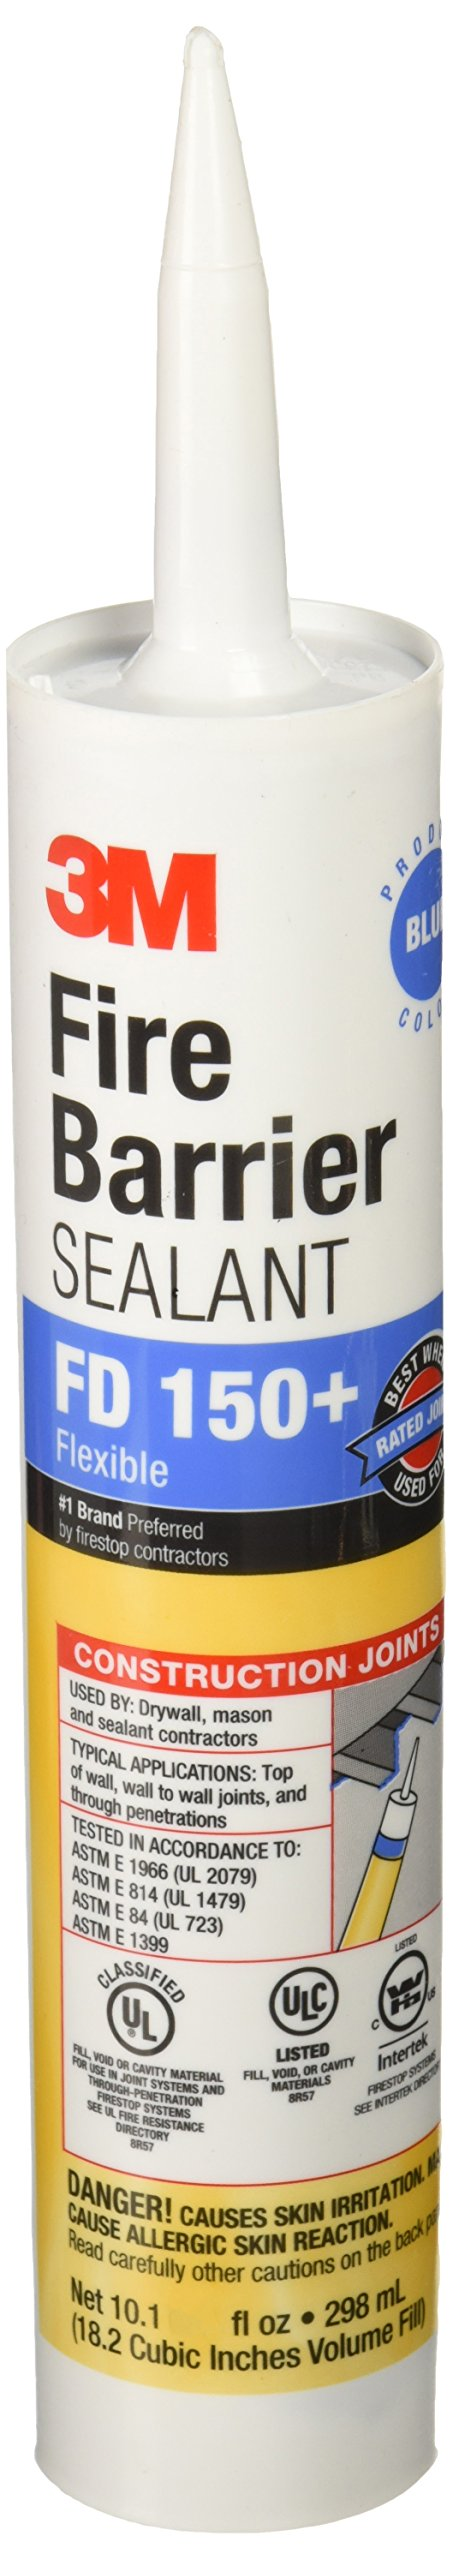 3M Fire Barrier Sealant FD 150+, Blue, 10.1 fl oz Cartridge